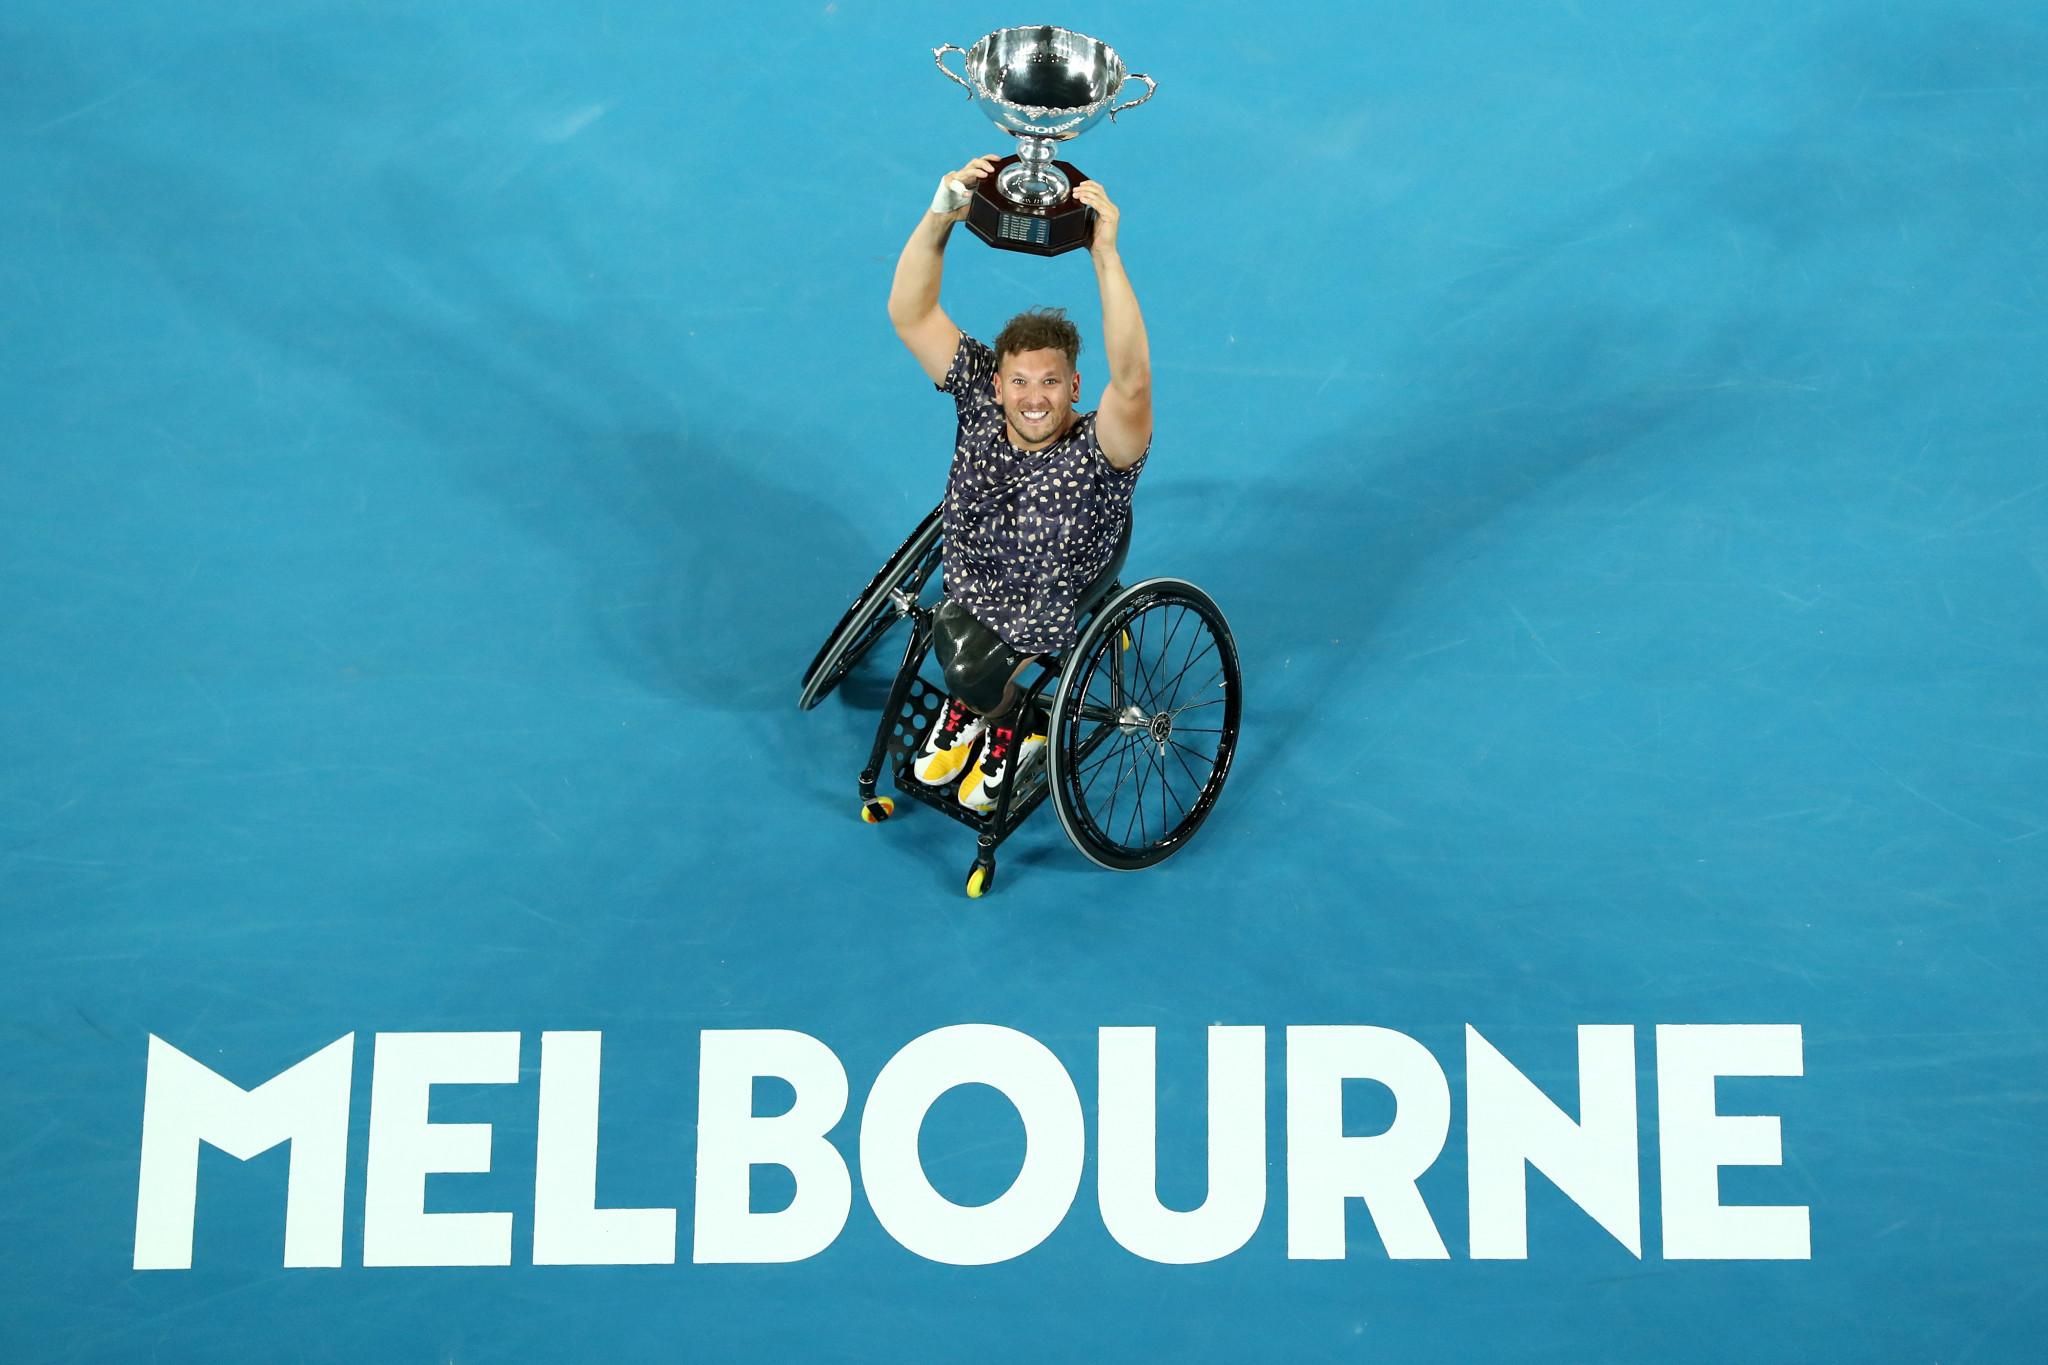 Alcott to begin quest for seventh Australian Open quad singles title in a row versus Davidson